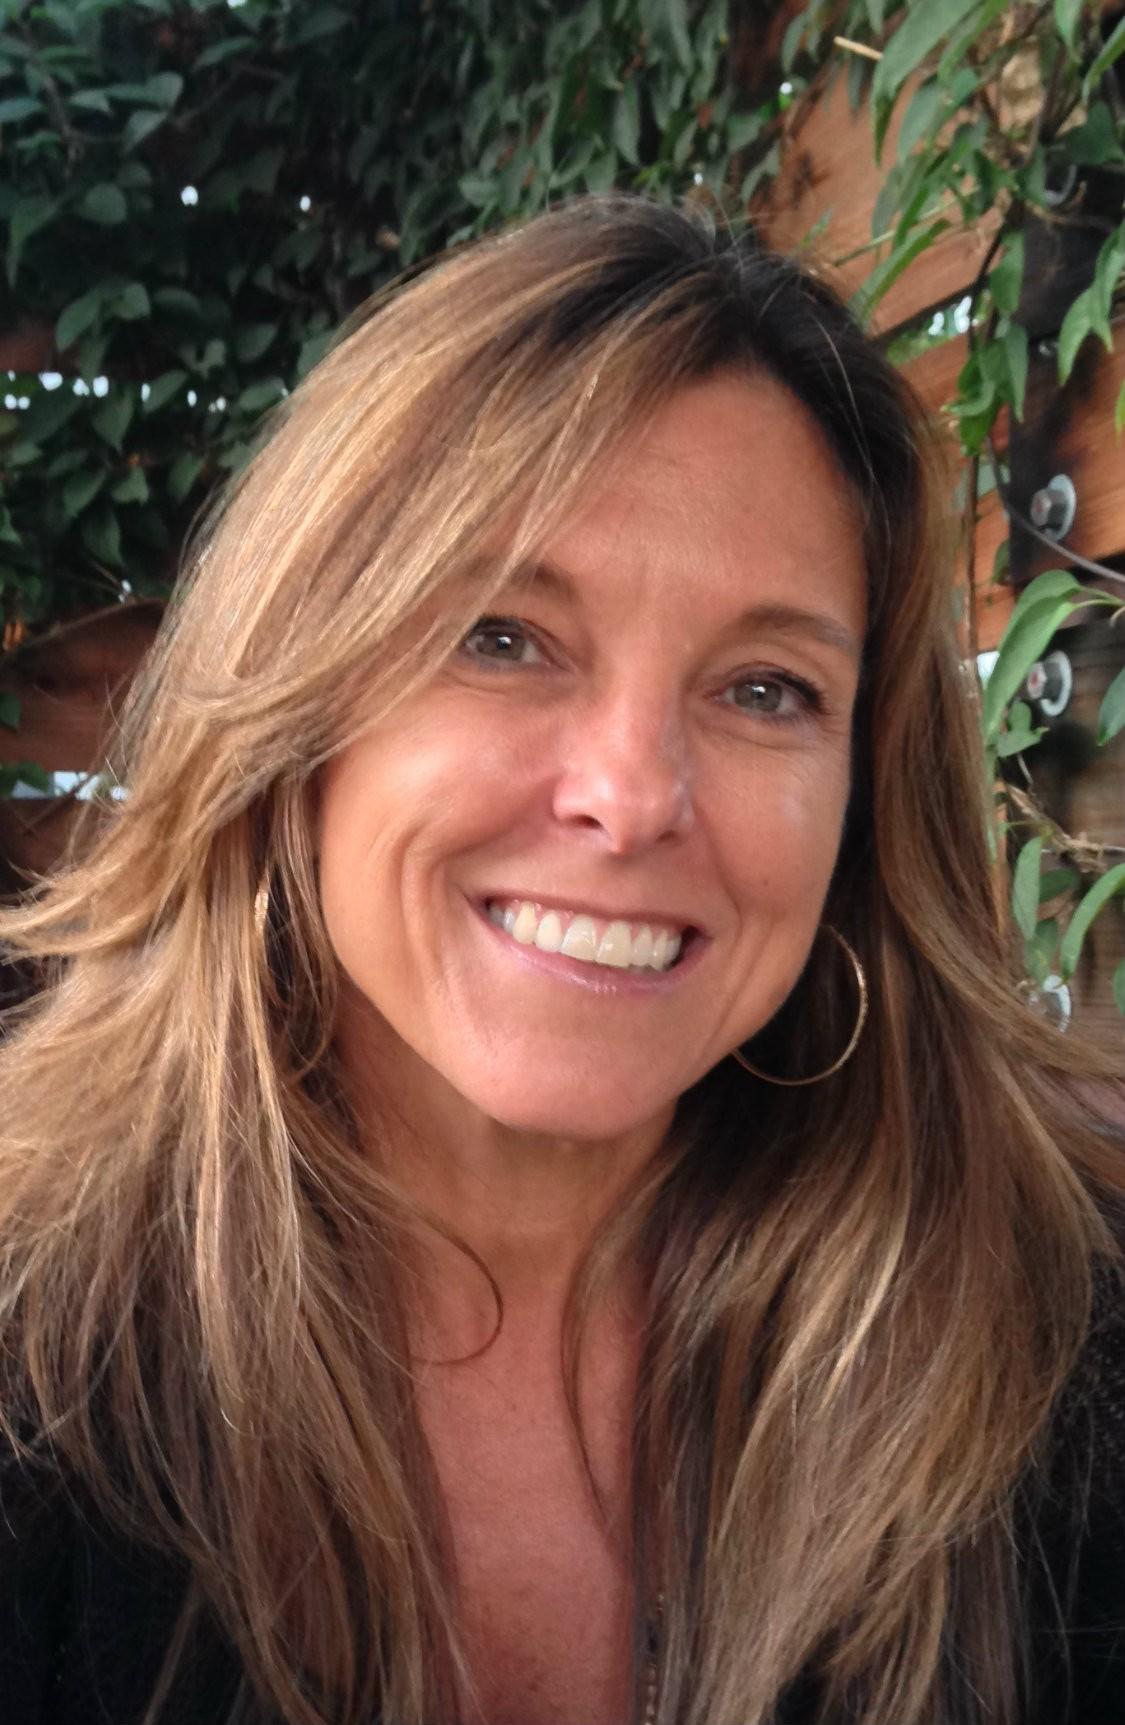 photo of Heidi L. Holst-Knudsen